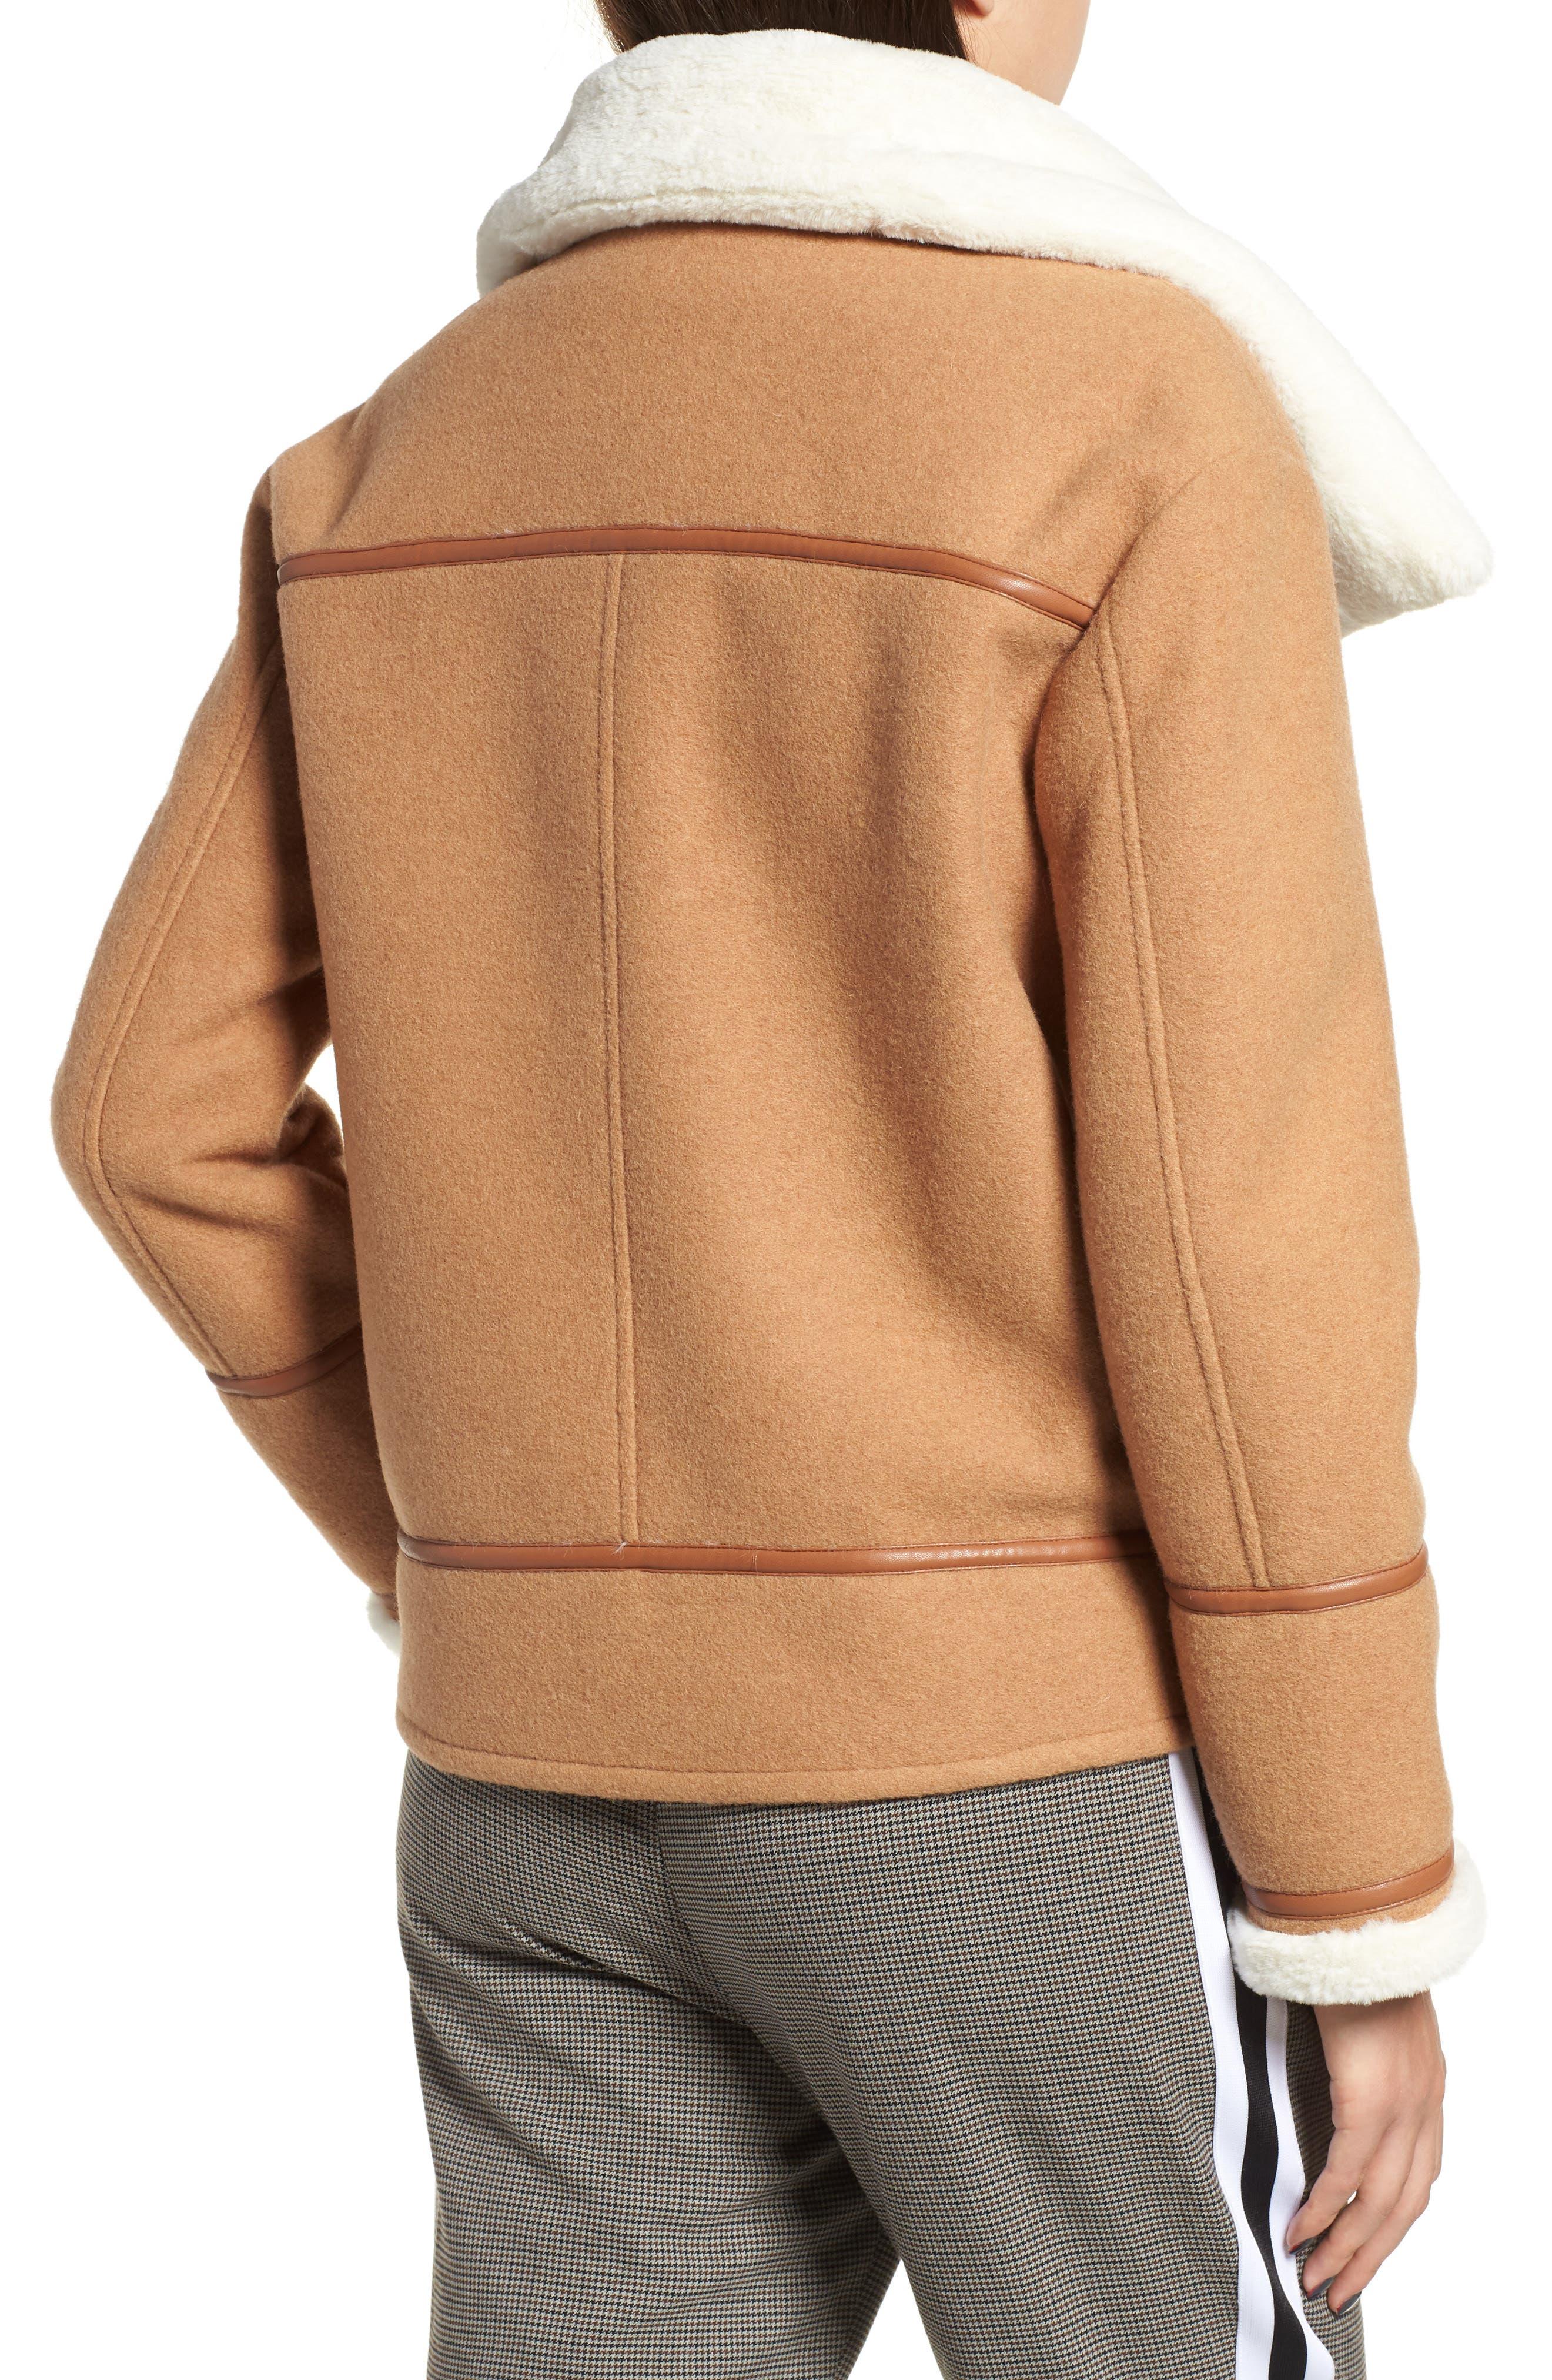 NVLT, Brushed Melton Wool Blend Jacket, Alternate thumbnail 2, color, CAMEL/ CREAM